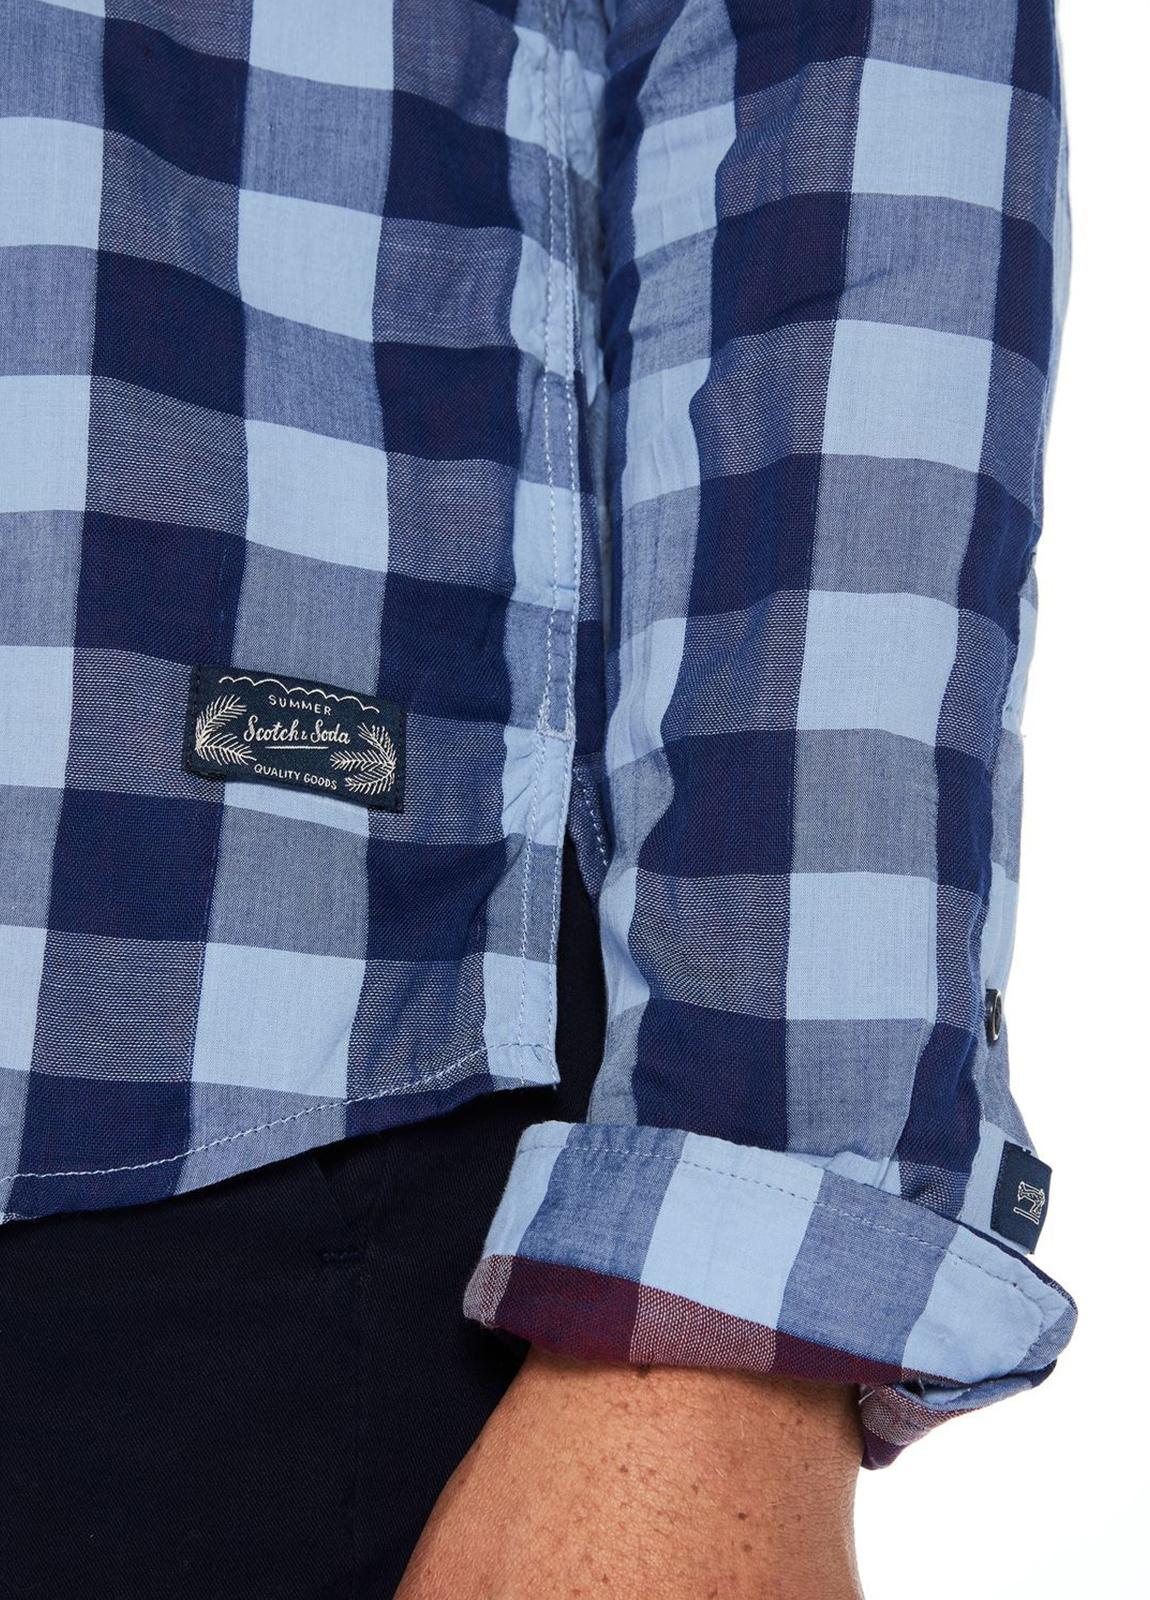 Camisa regular fit, cuadros en azul. Algodón. - Ítem1